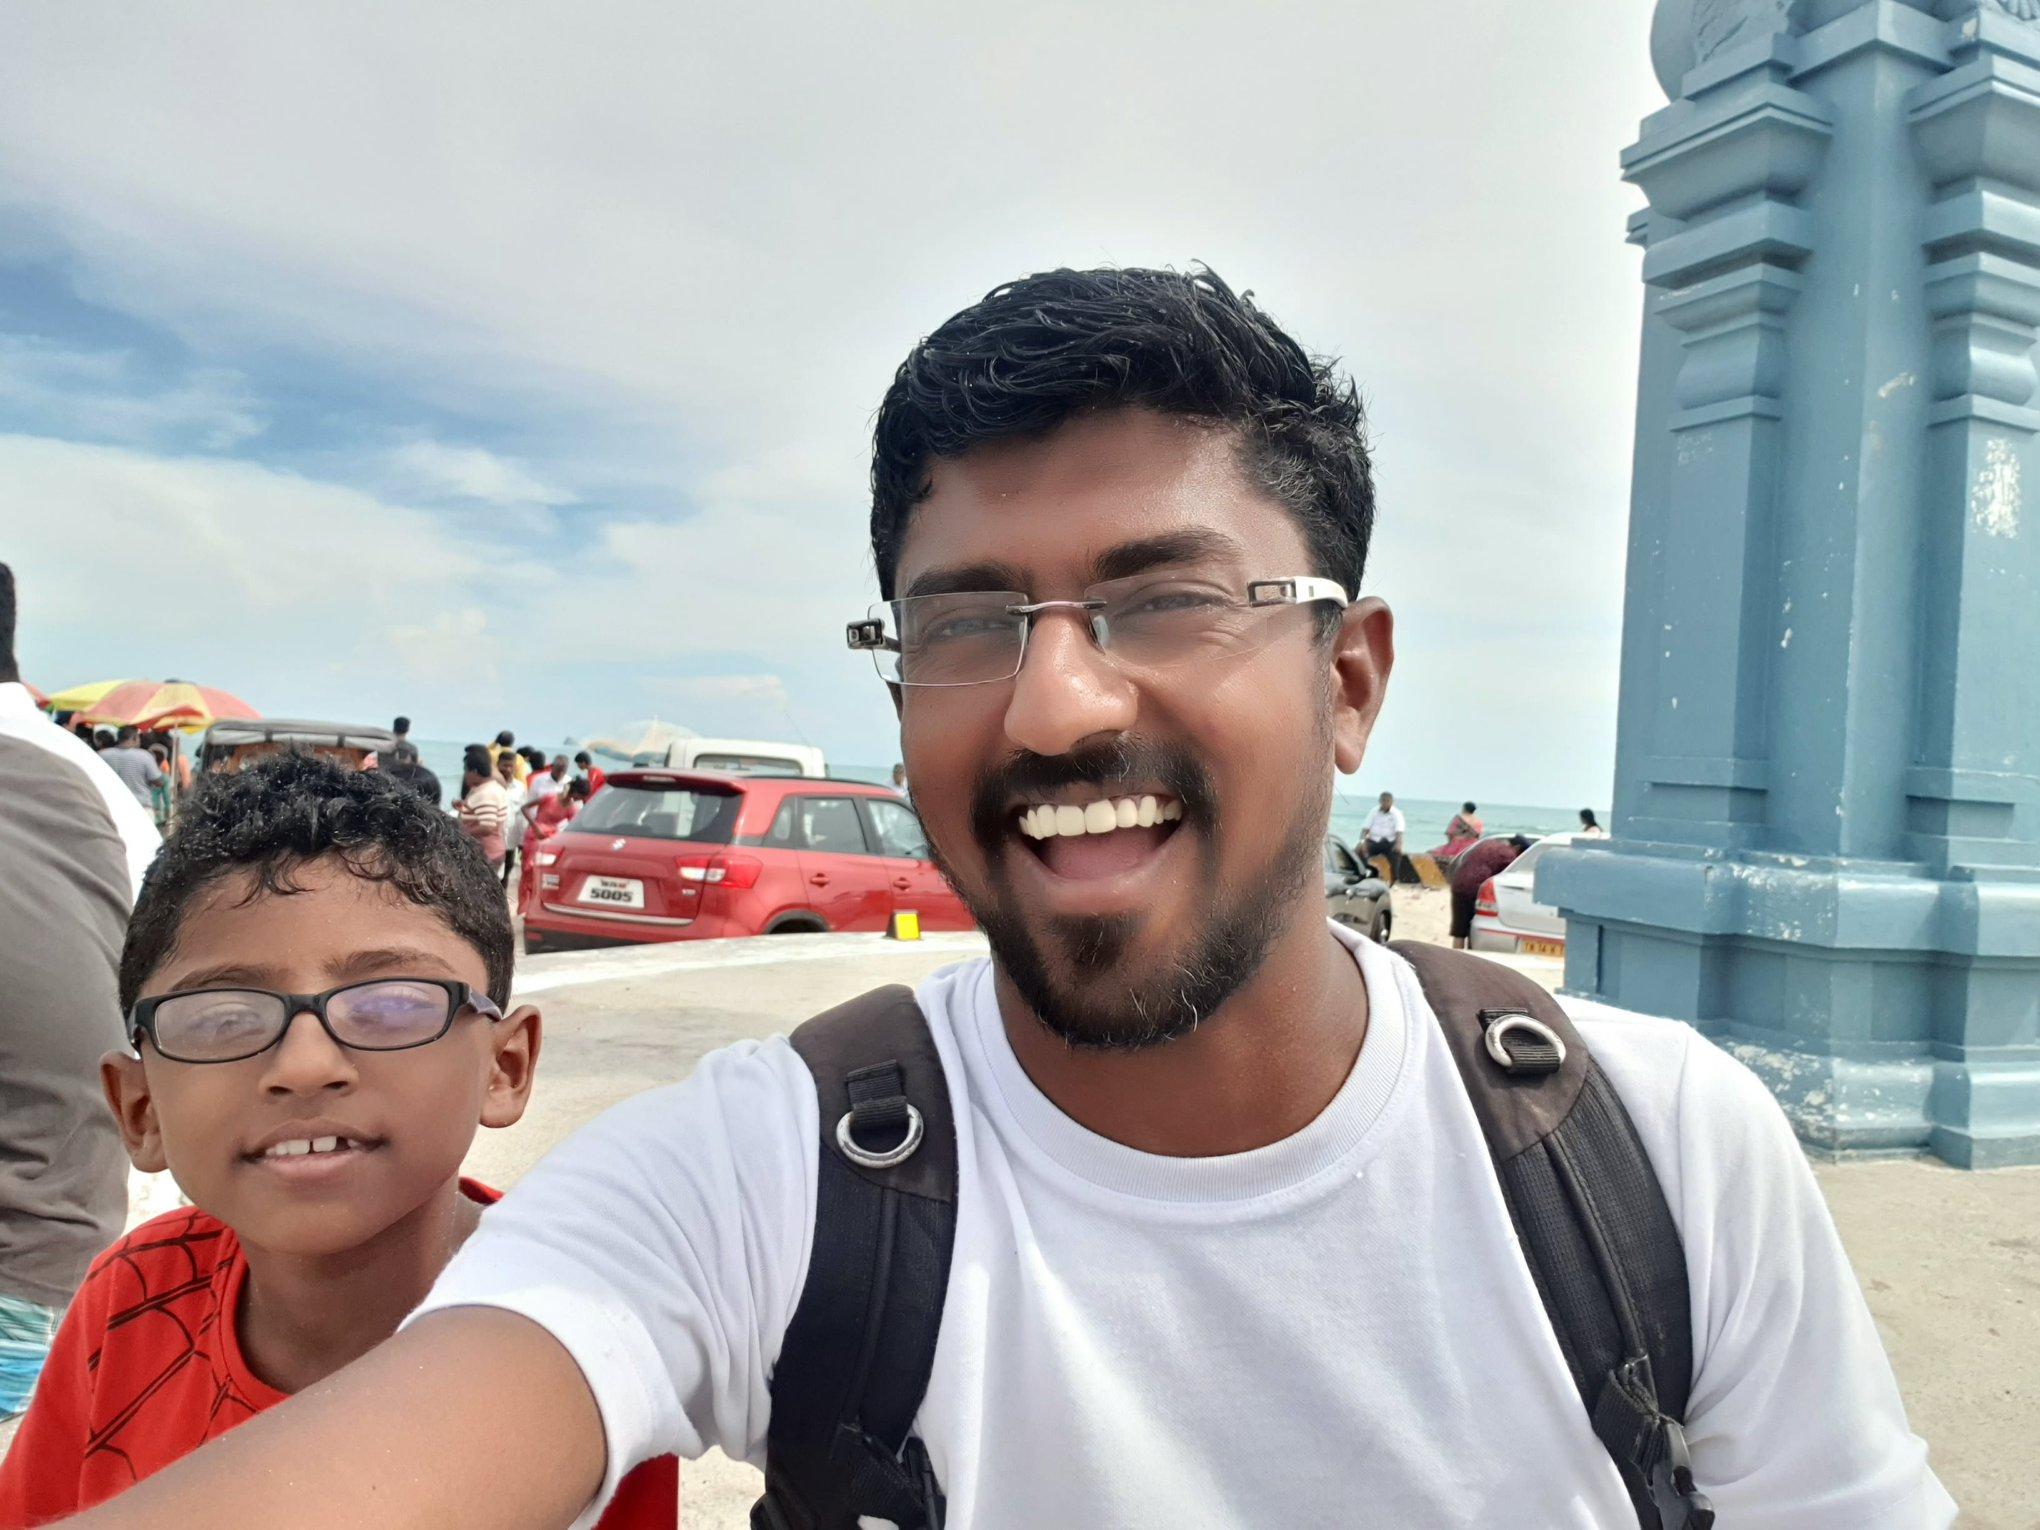 Posing at Arichal Munai near Dhanushkodi. This is India's last habitable landmass after which Sri Lanka begins in 18 kms